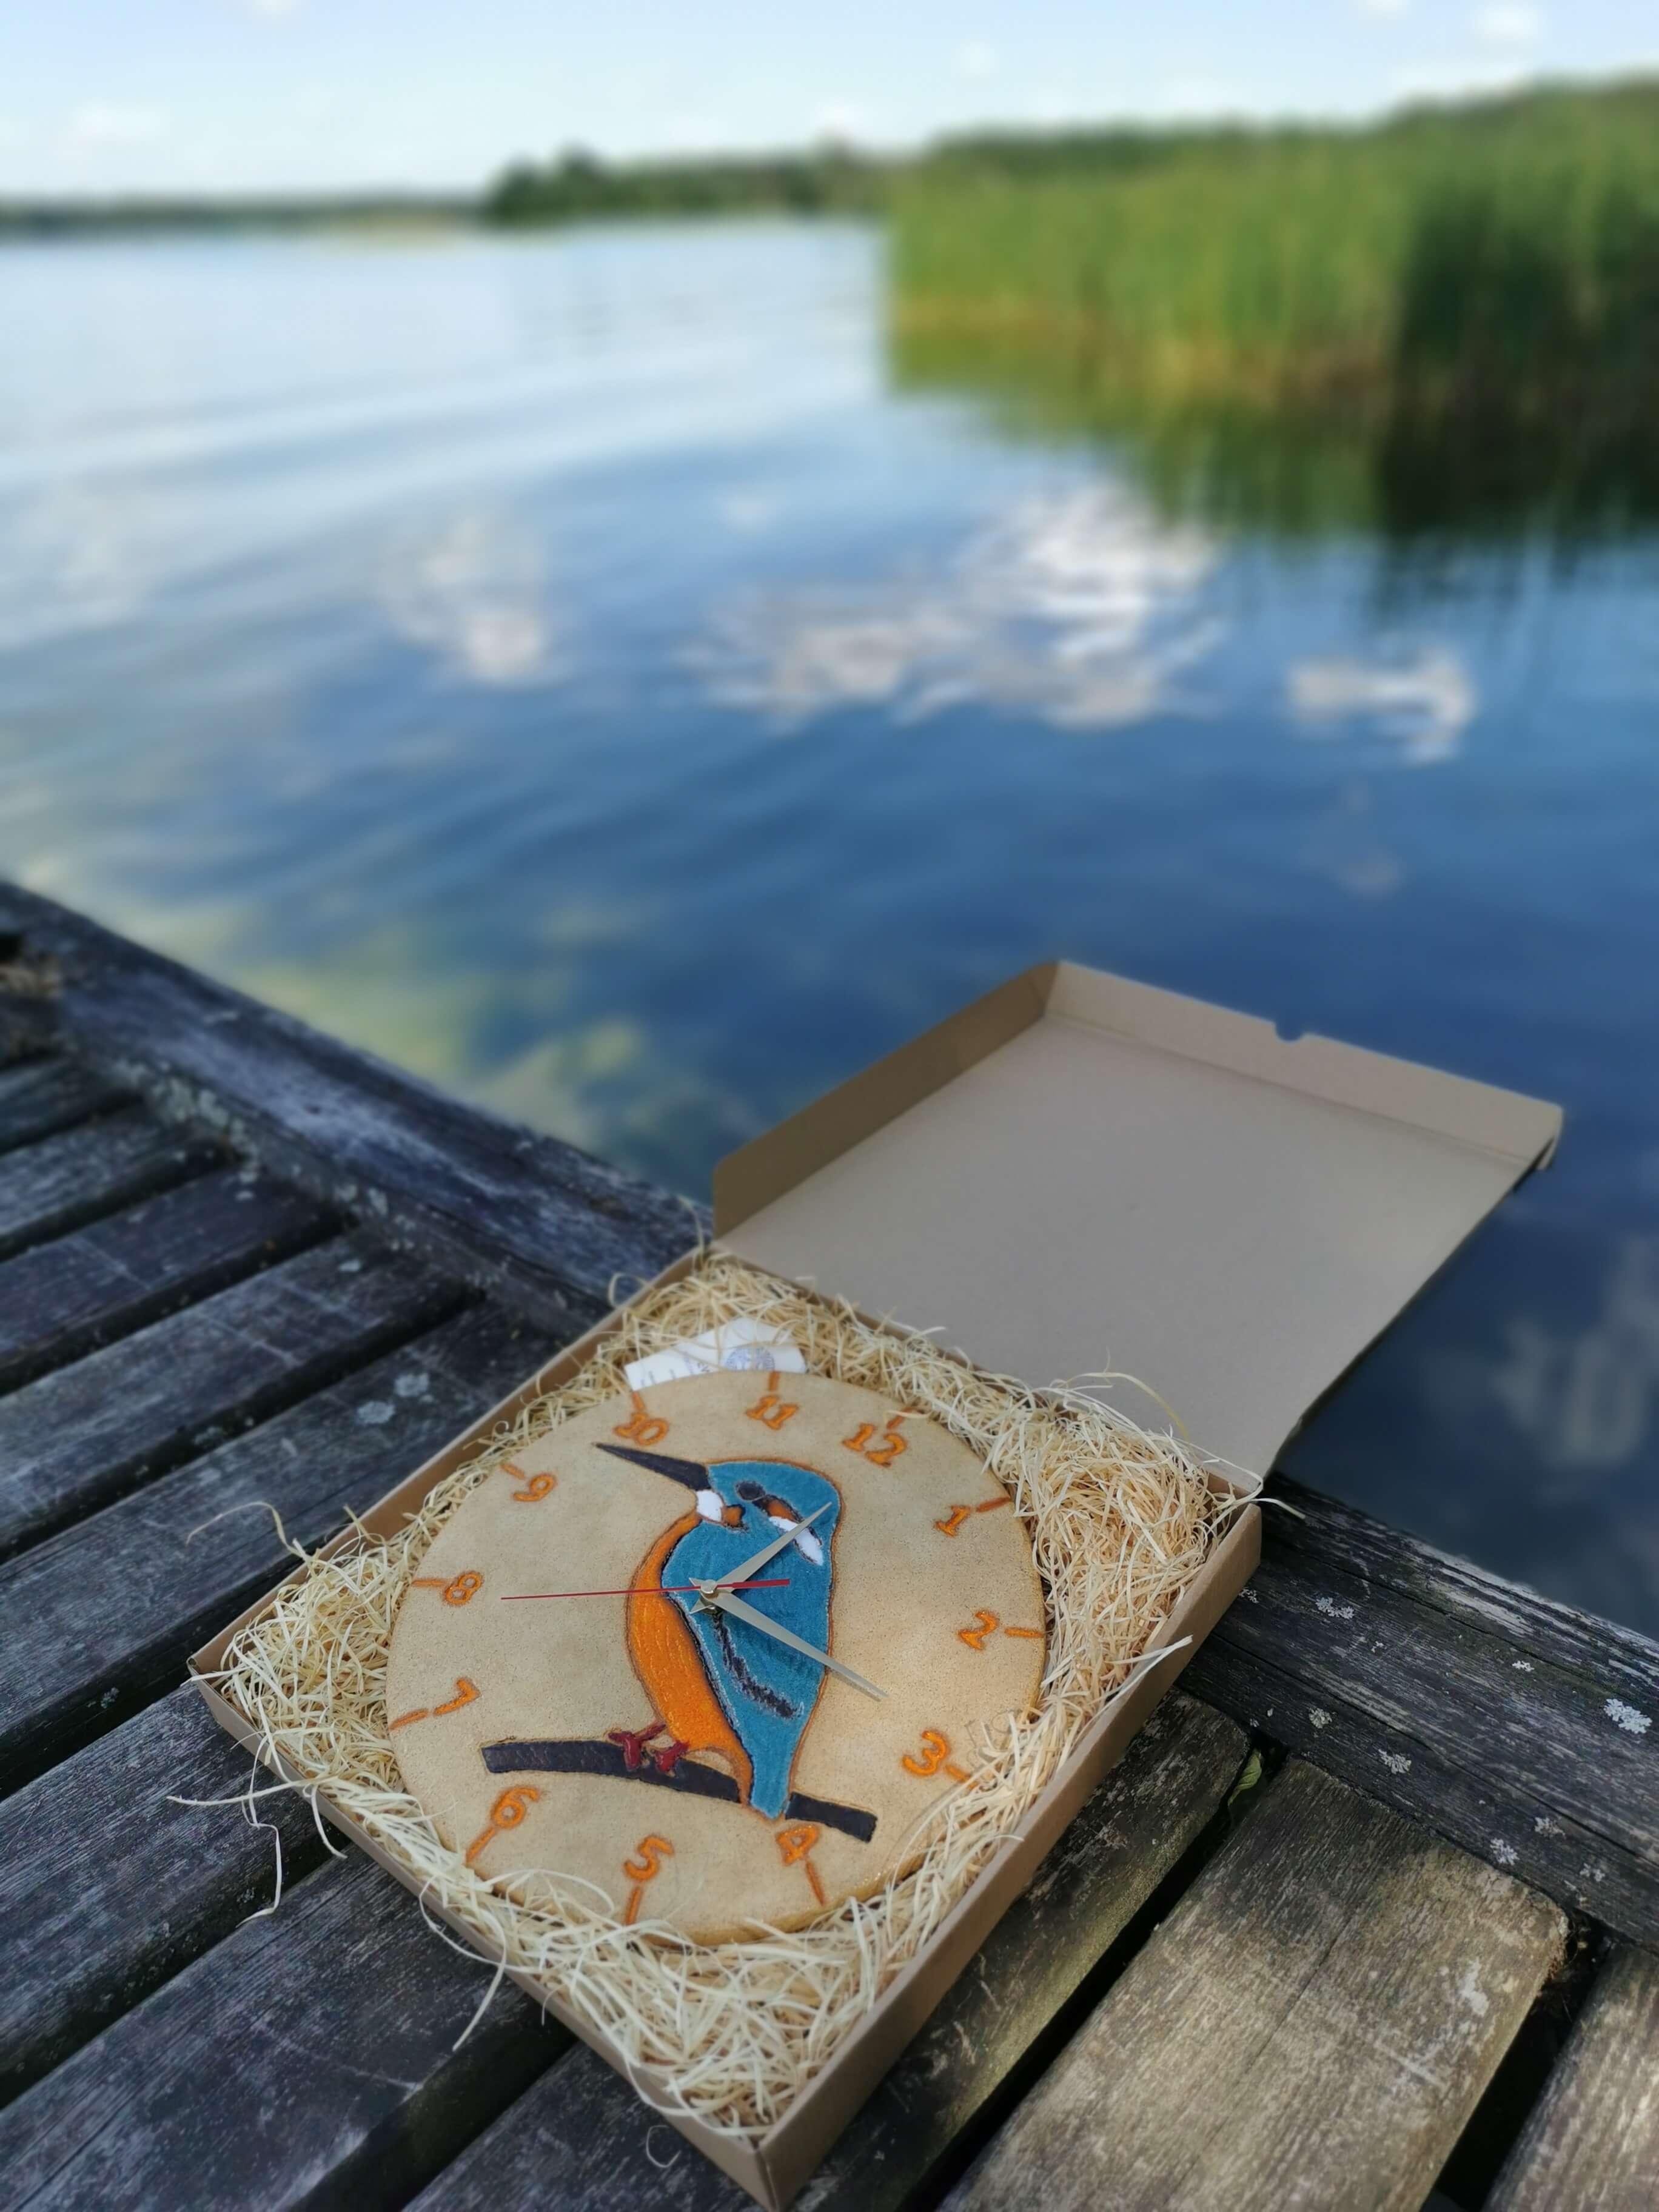 ptasi-zegar-zimorodek-nad-jeziorem